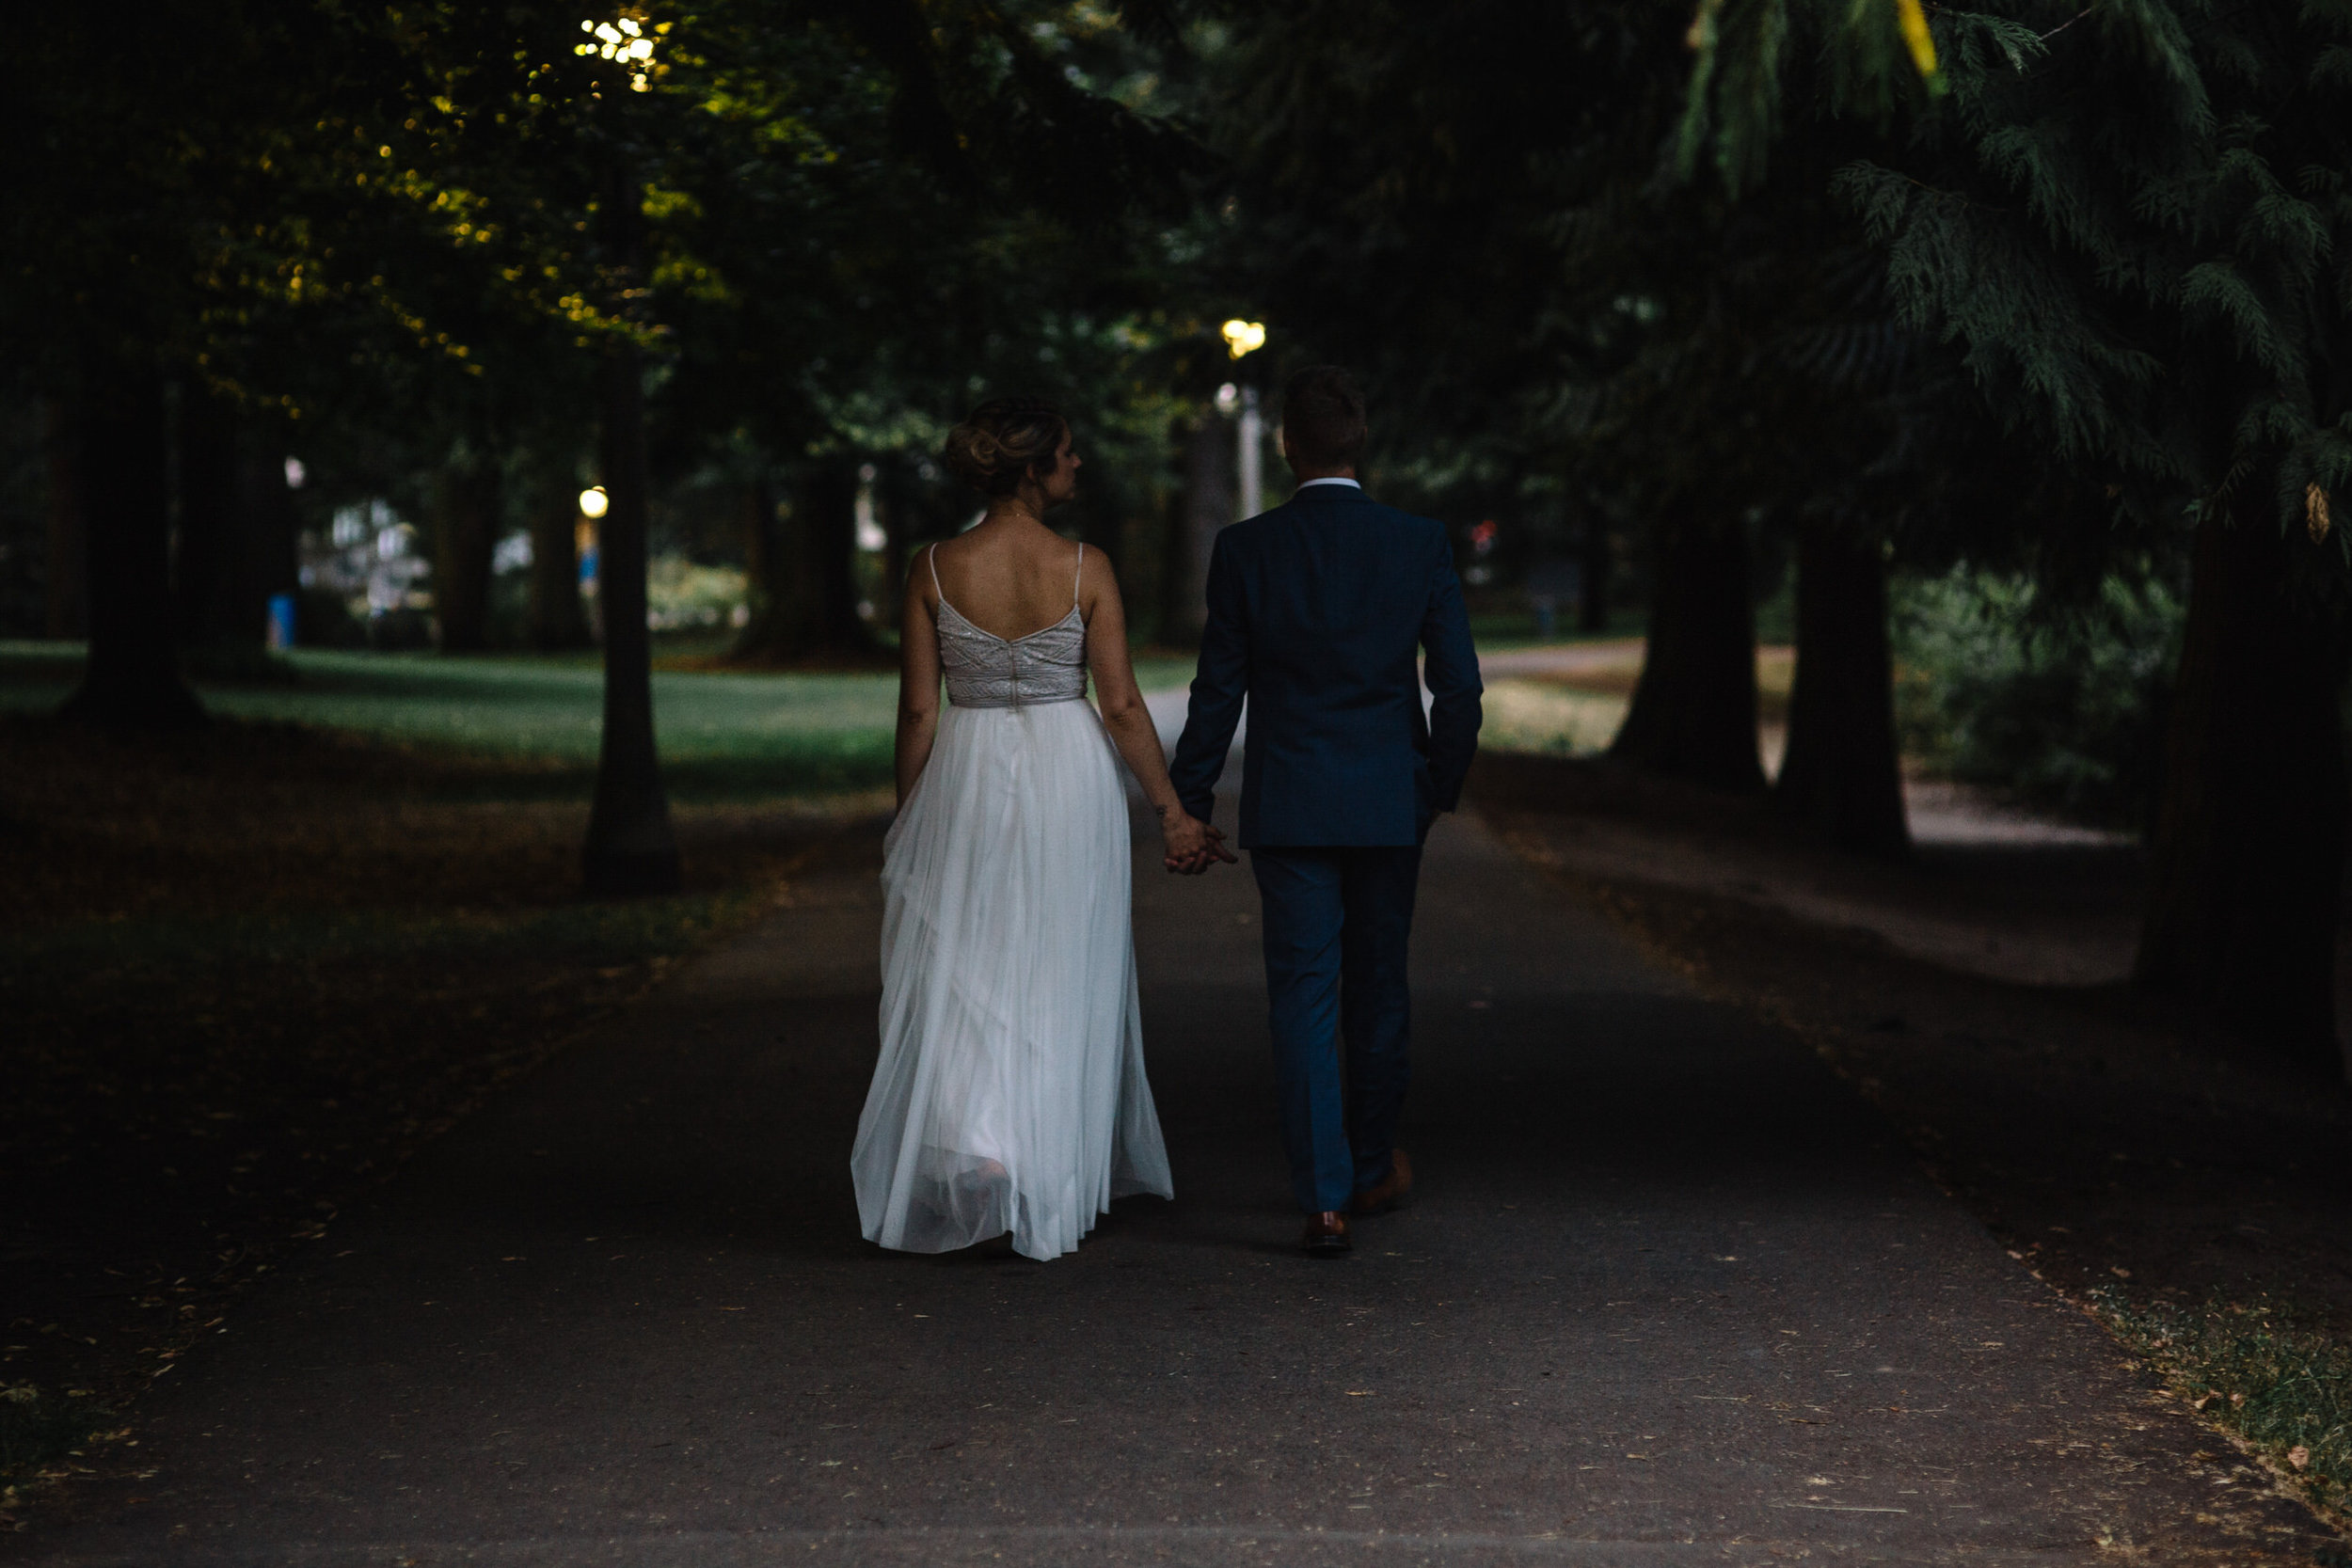 Laurelhurst Park club wedding photographer Portand pdx Oregon143.JPG